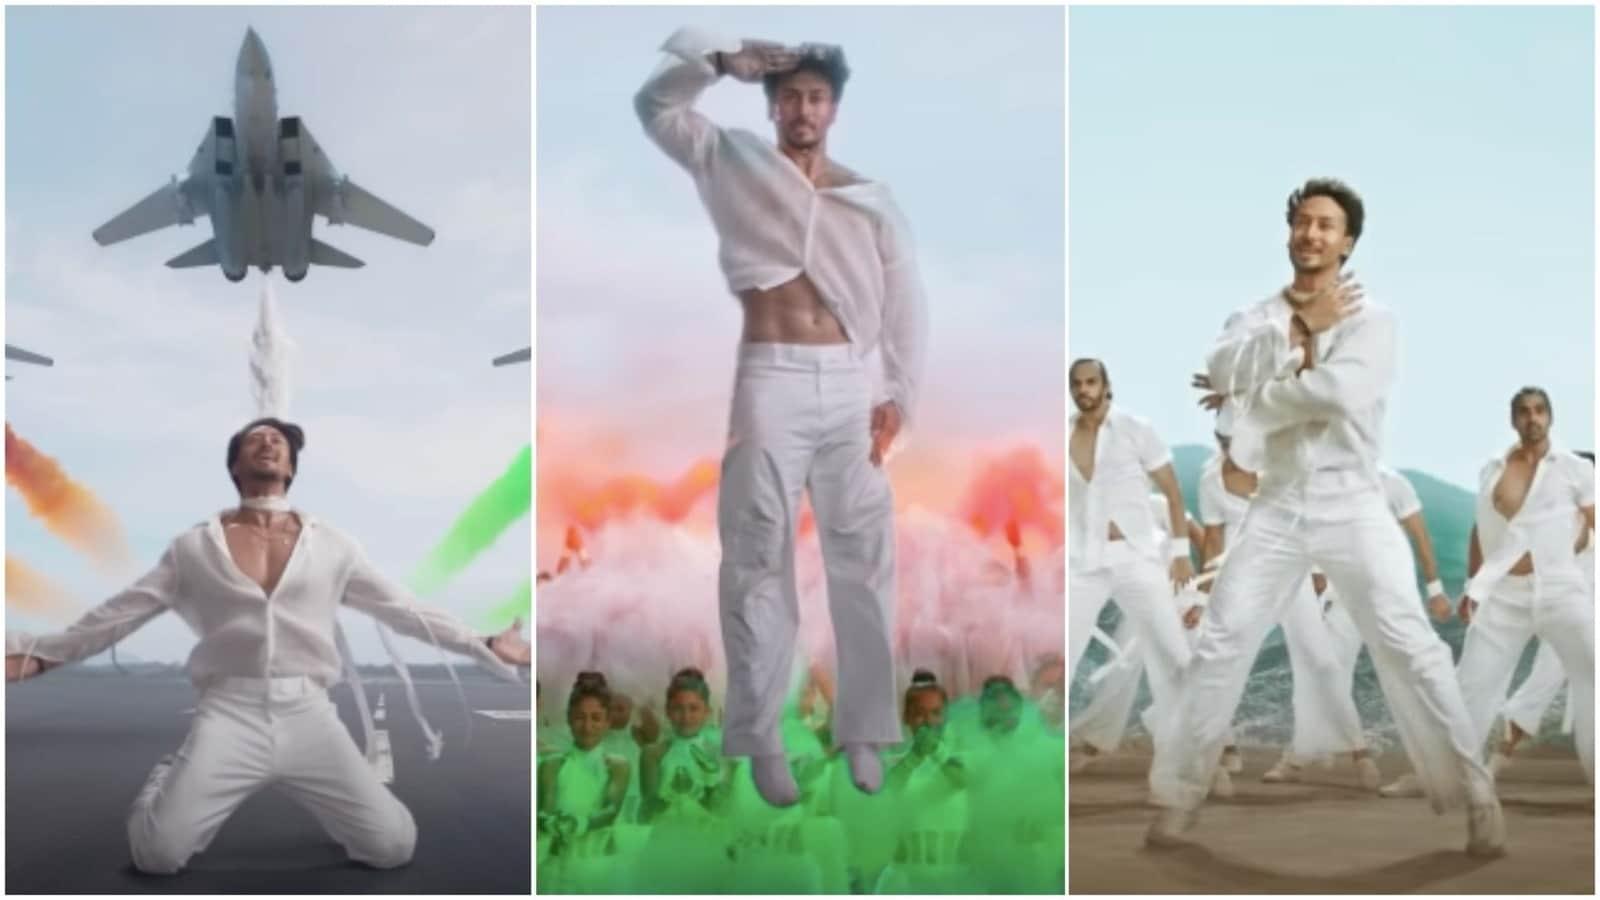 Vande Mataram: Tiger climbs mountain, poses on runway in music video teaser